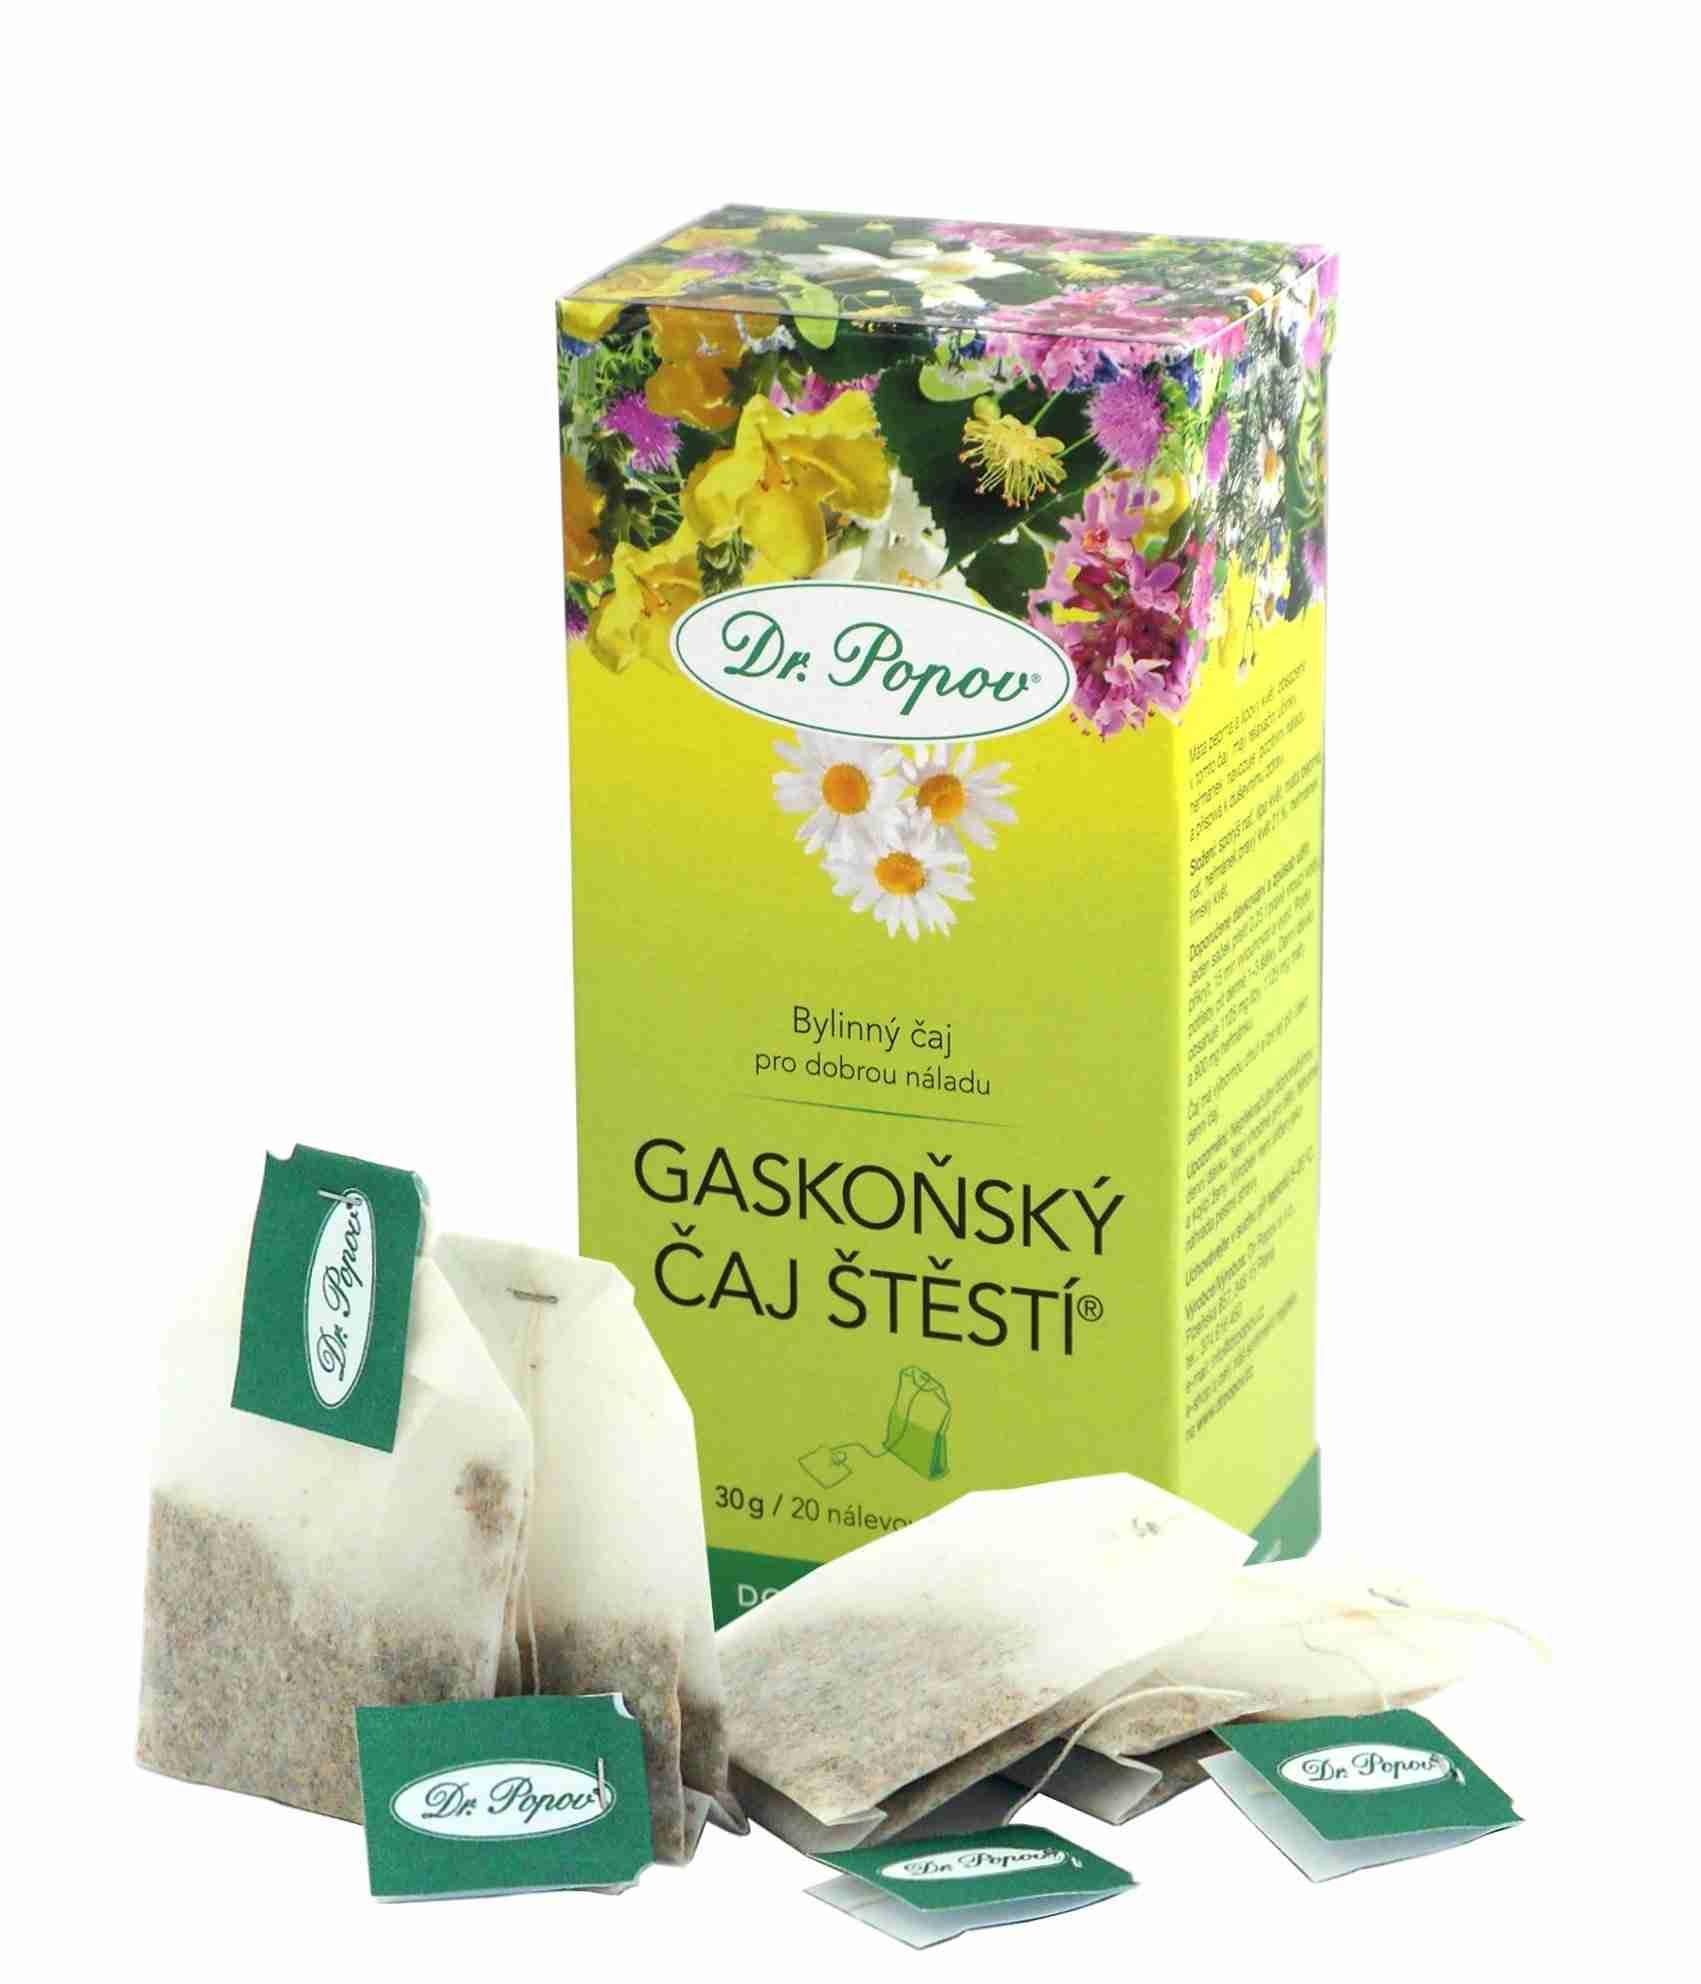 Dr. Popov Gaskoňský čaj štěstí 20 n.s.